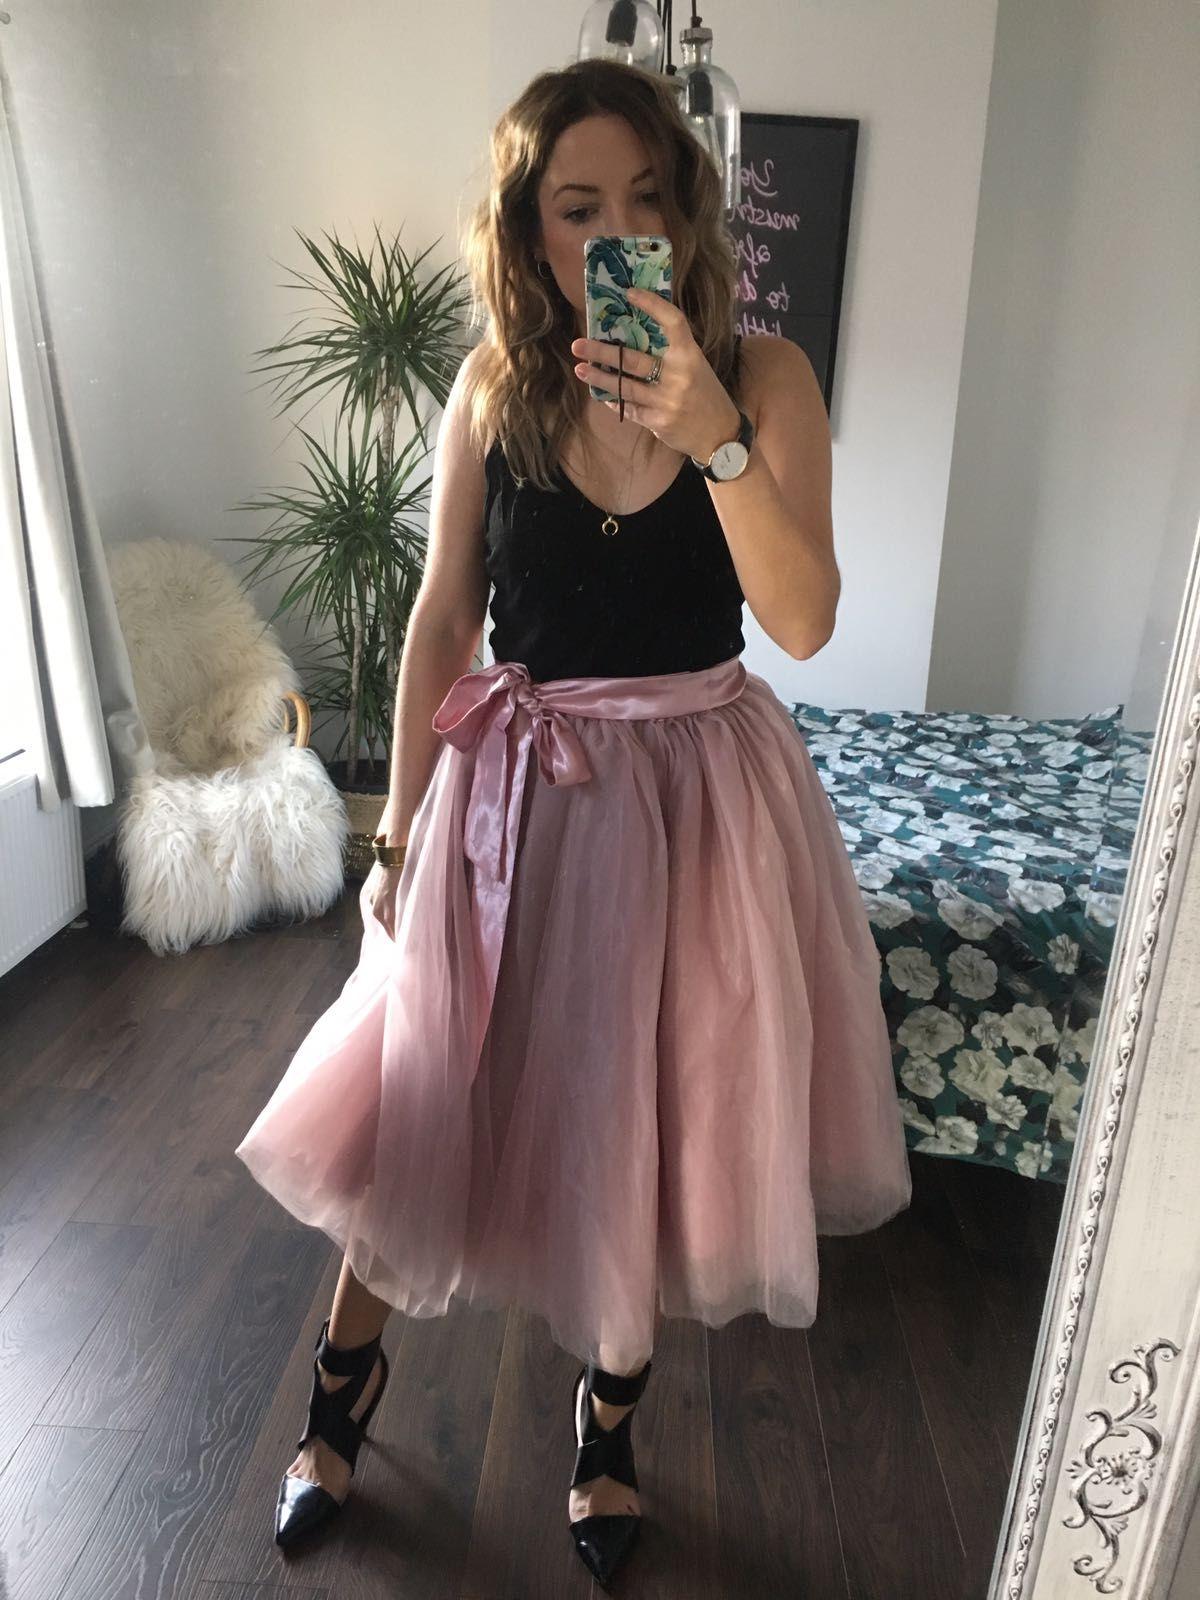 18b4b15ed3a Antique Rose Midi Tulle Tutu Skirt - Elsie s Attic